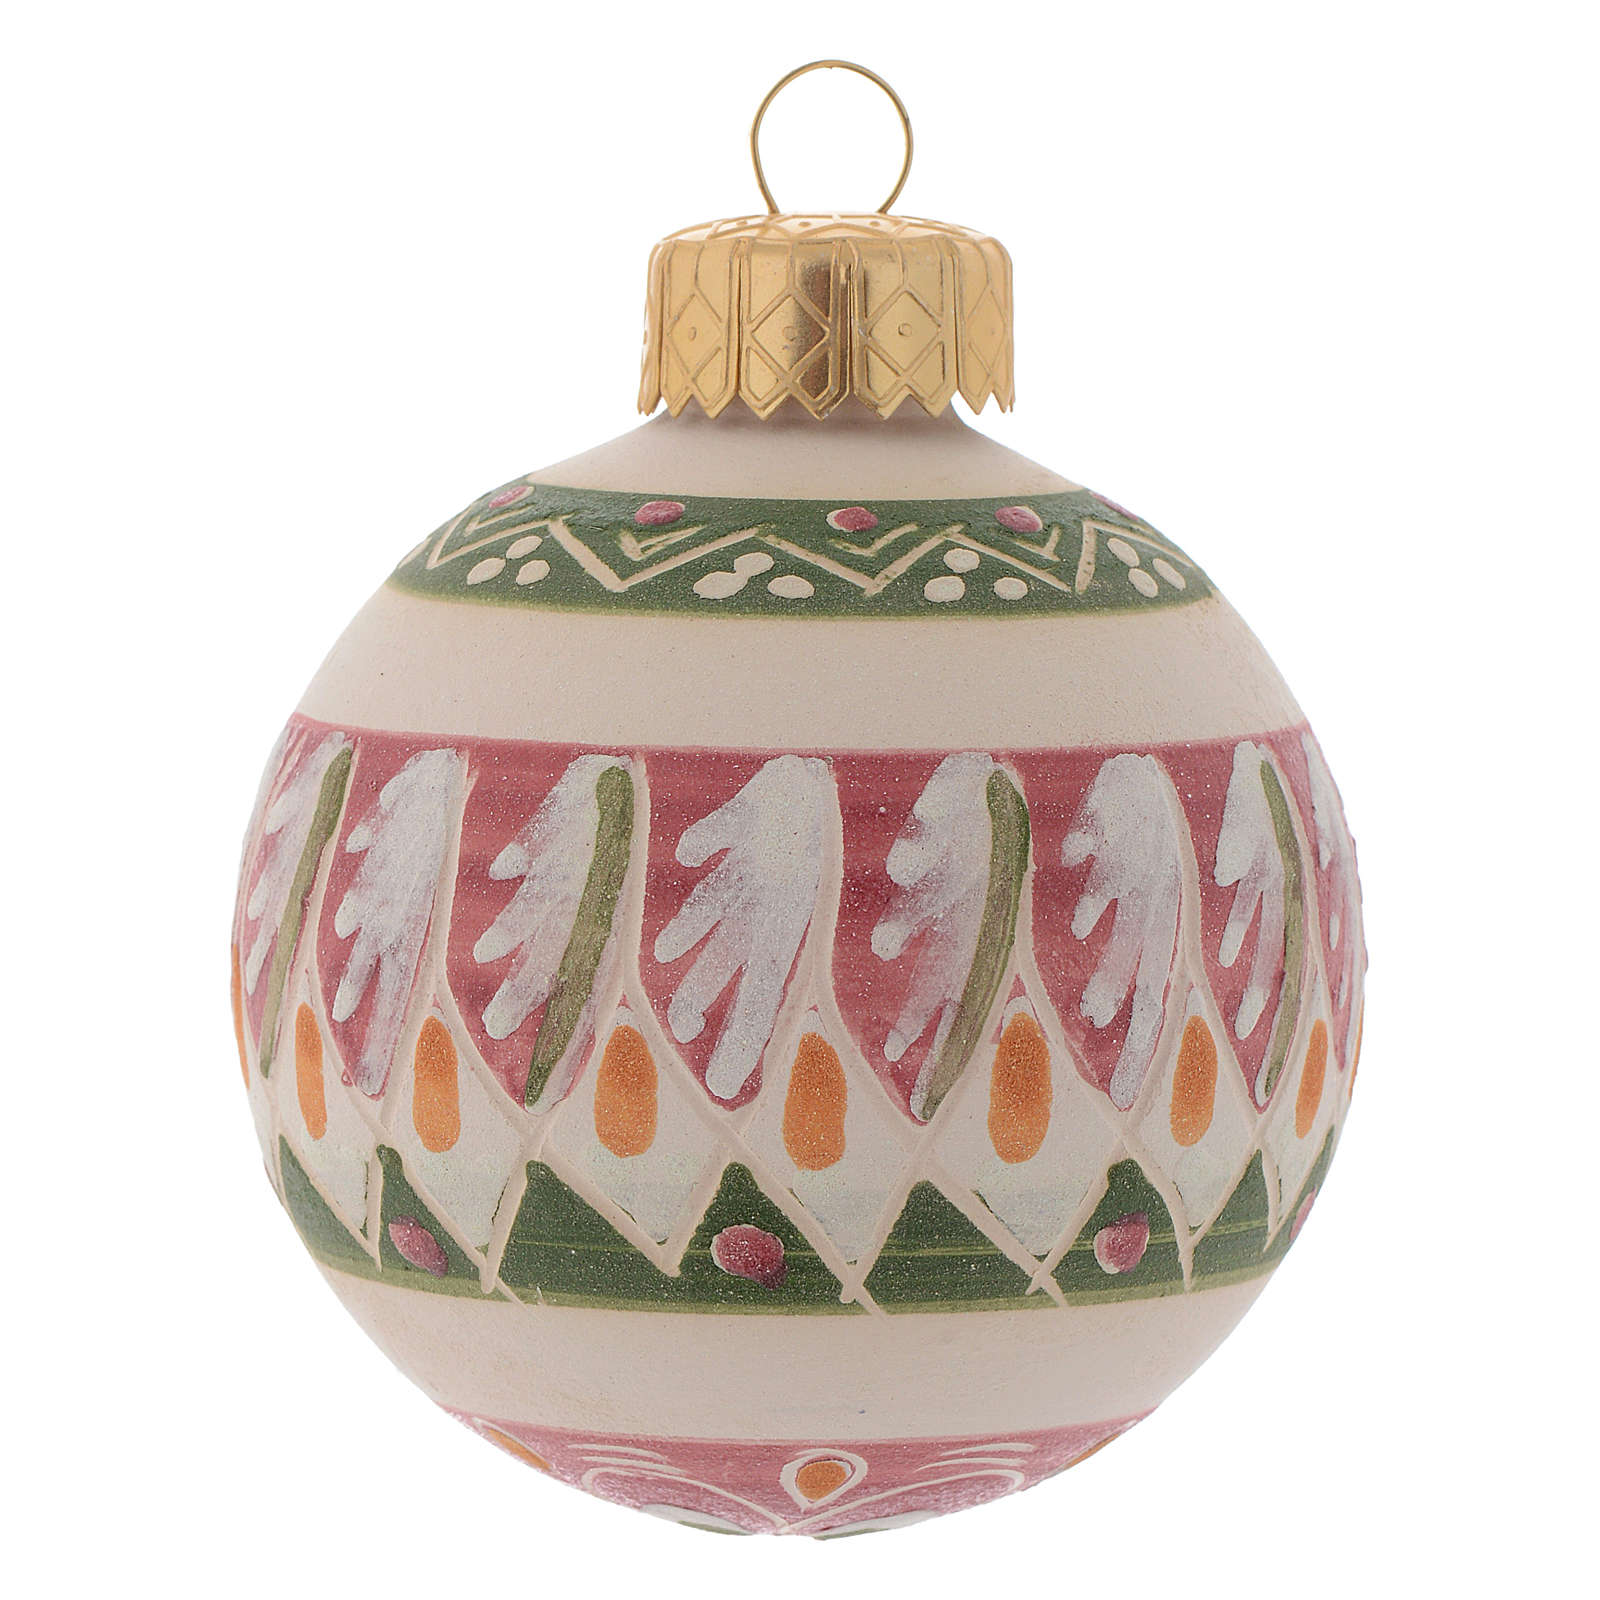 Bola de Navidad de terracota 60 mm rosado pálido 4